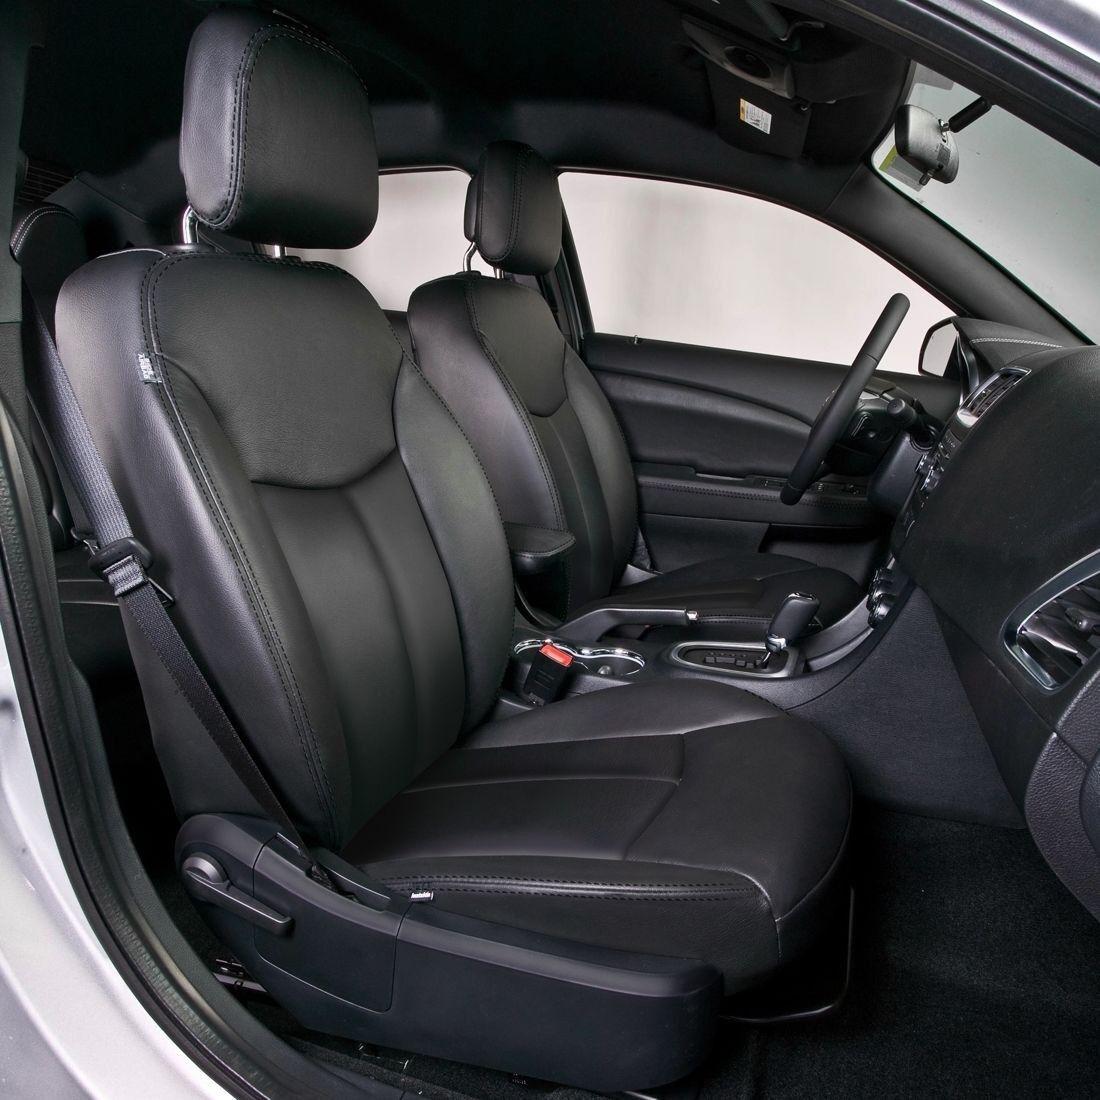 2013 Dodge Avenger Se >> KATZKIN BLACK REPLA LEATHER INTERIOR CVRS FITS 2011 2012 ...